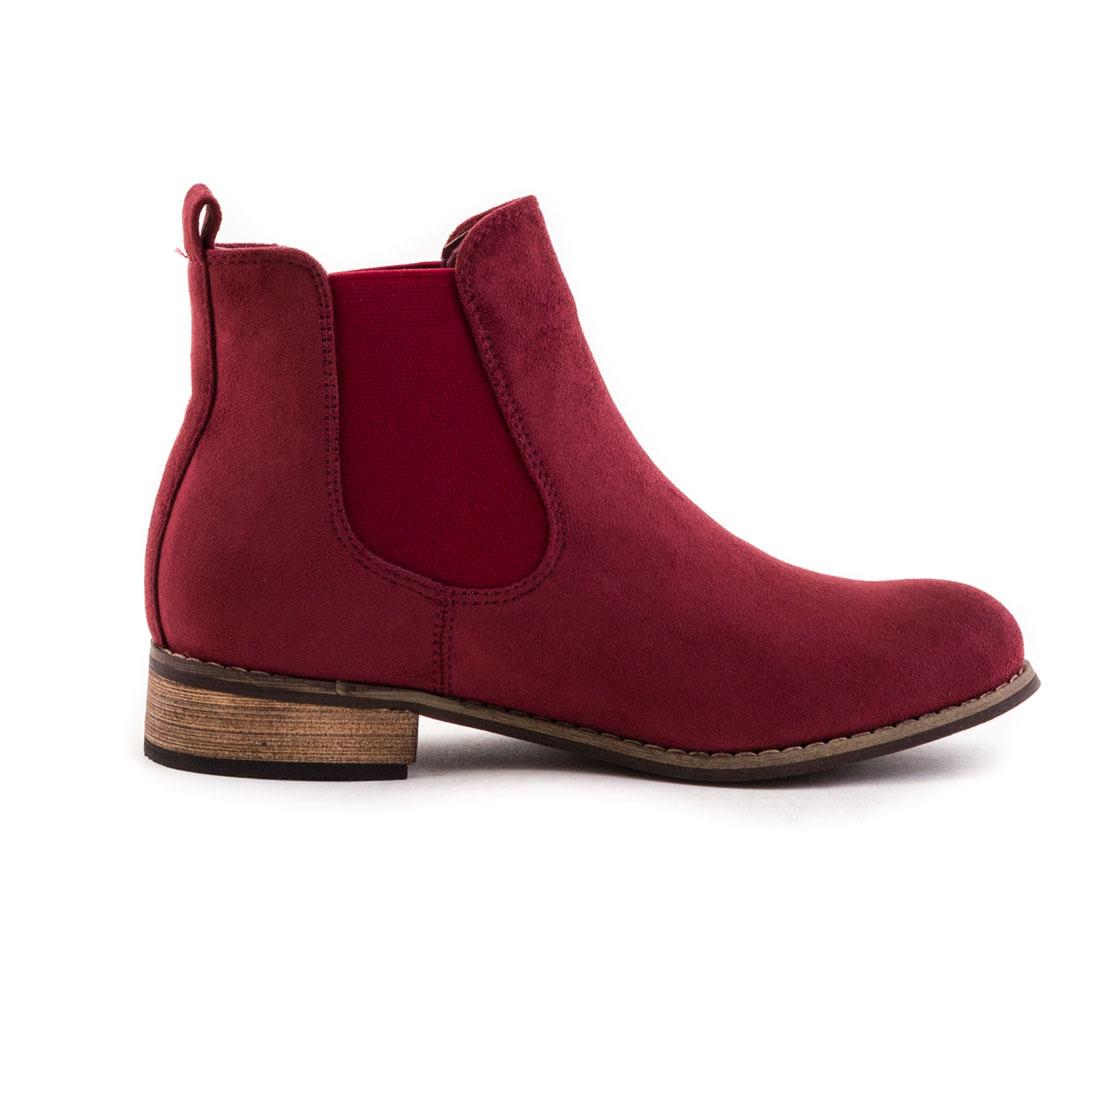 neu damen schlupf stiefeletten worker ankle boots schuhe. Black Bedroom Furniture Sets. Home Design Ideas